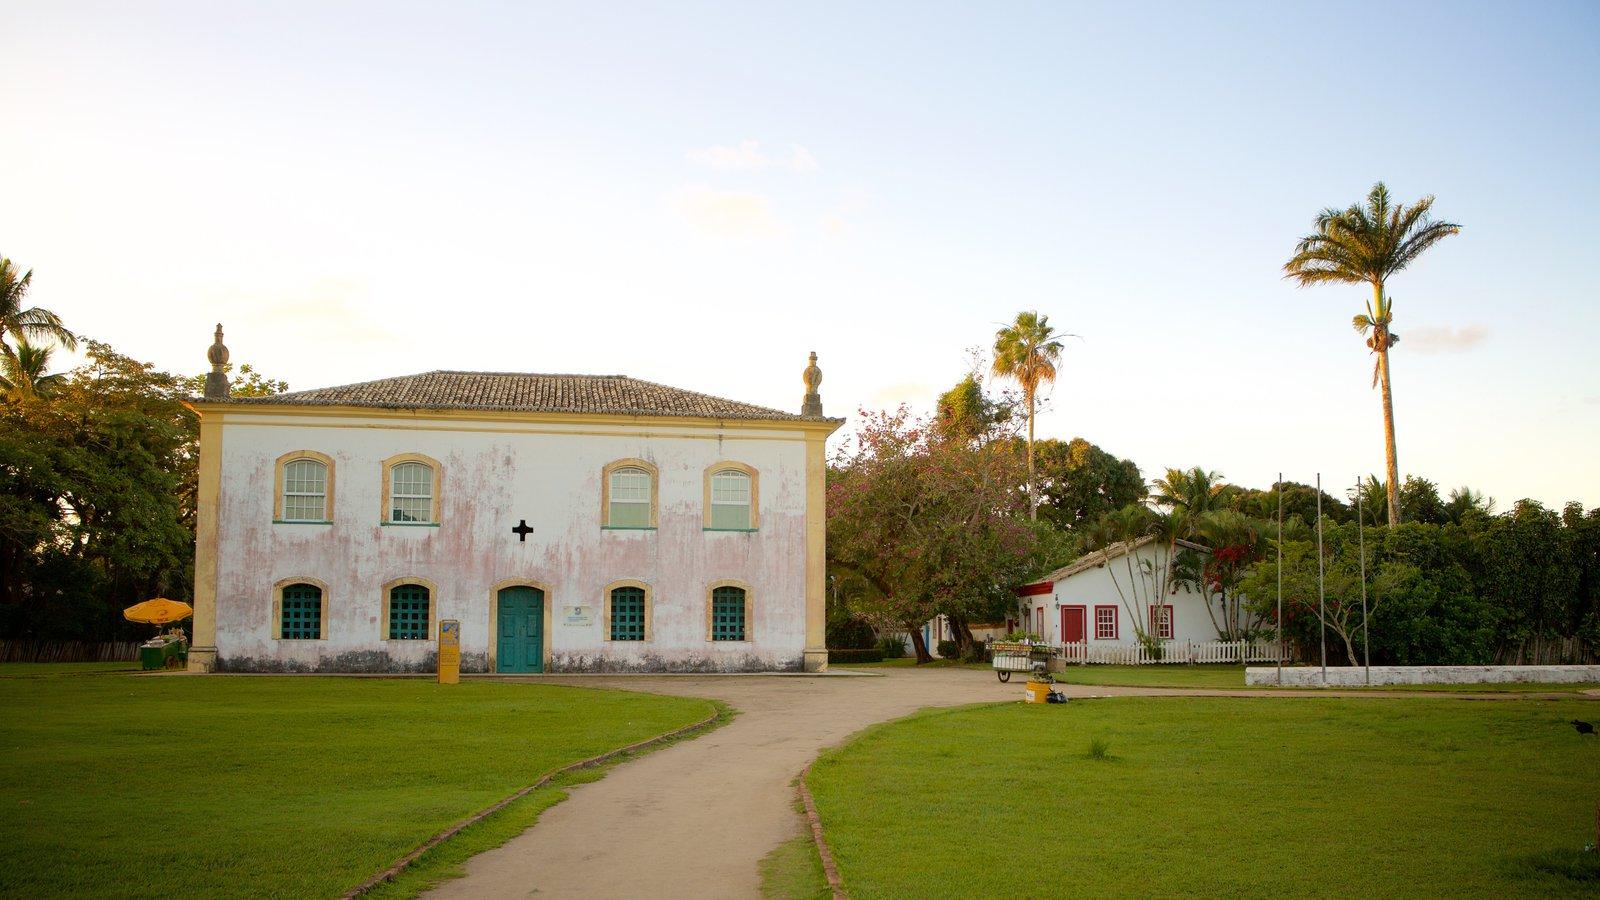 Porto Seguro caracterizando um parque e elementos de patrimônio